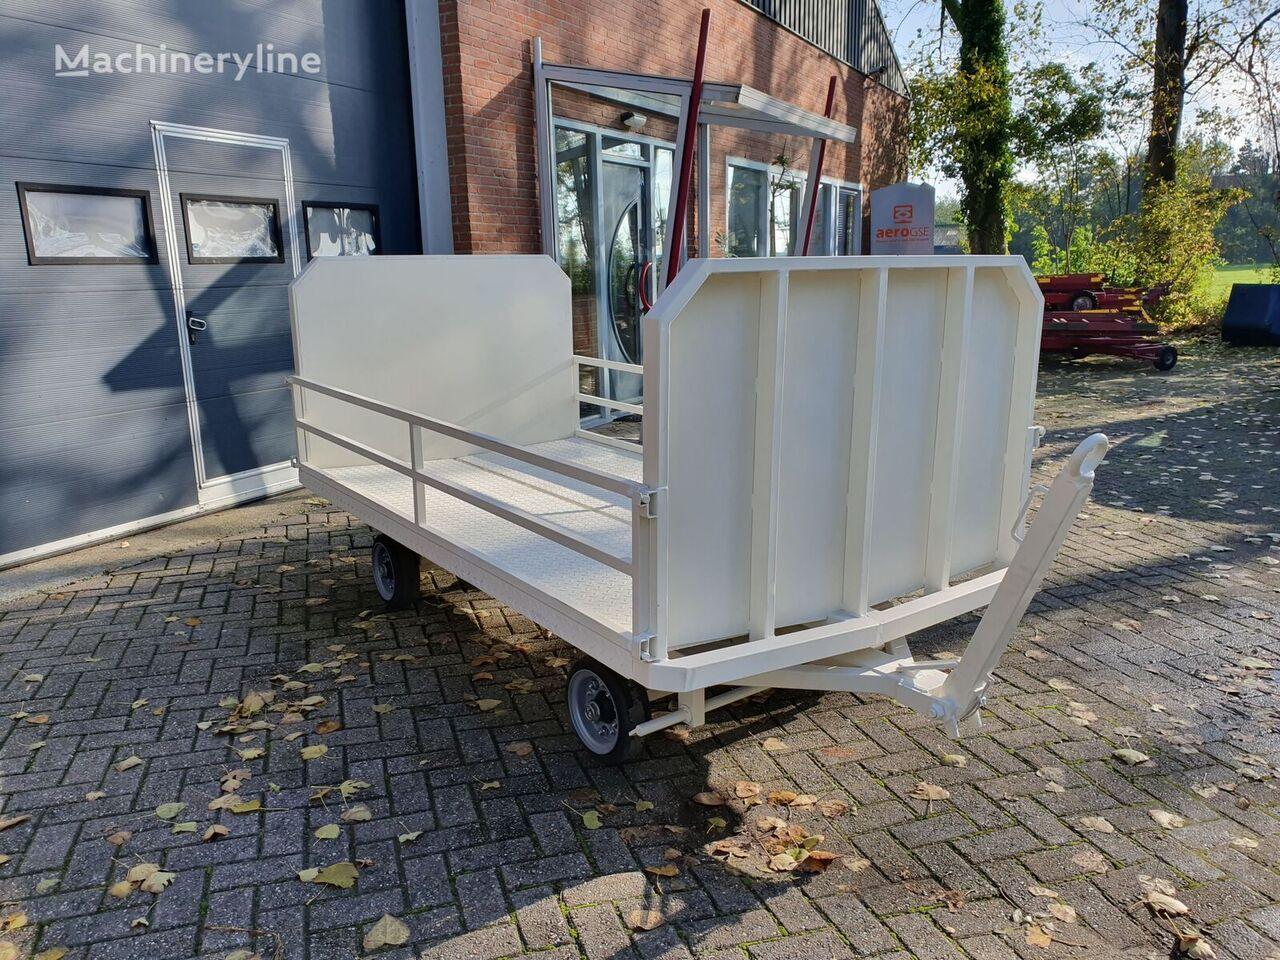 другая аэродромная техника YUMBO CPE / 1600 Baggage cart